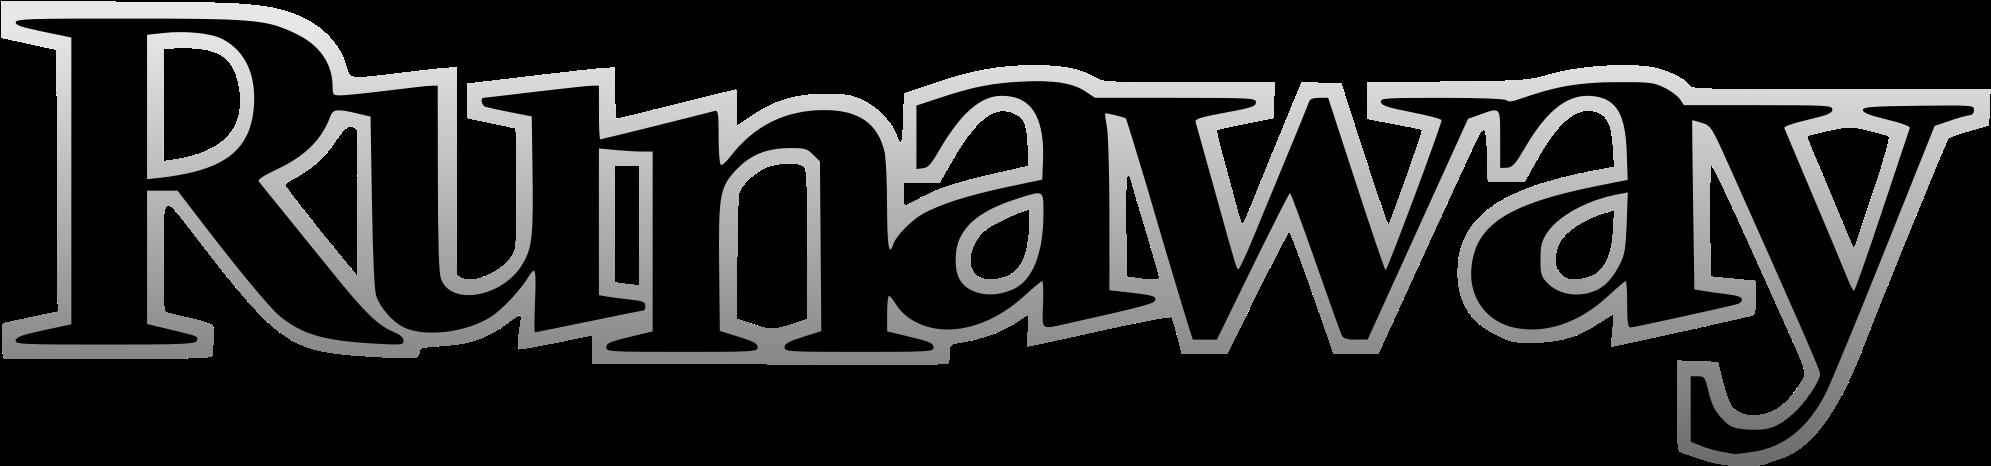 File Logo Svg Wikimedia Transparent Background - Runaway A